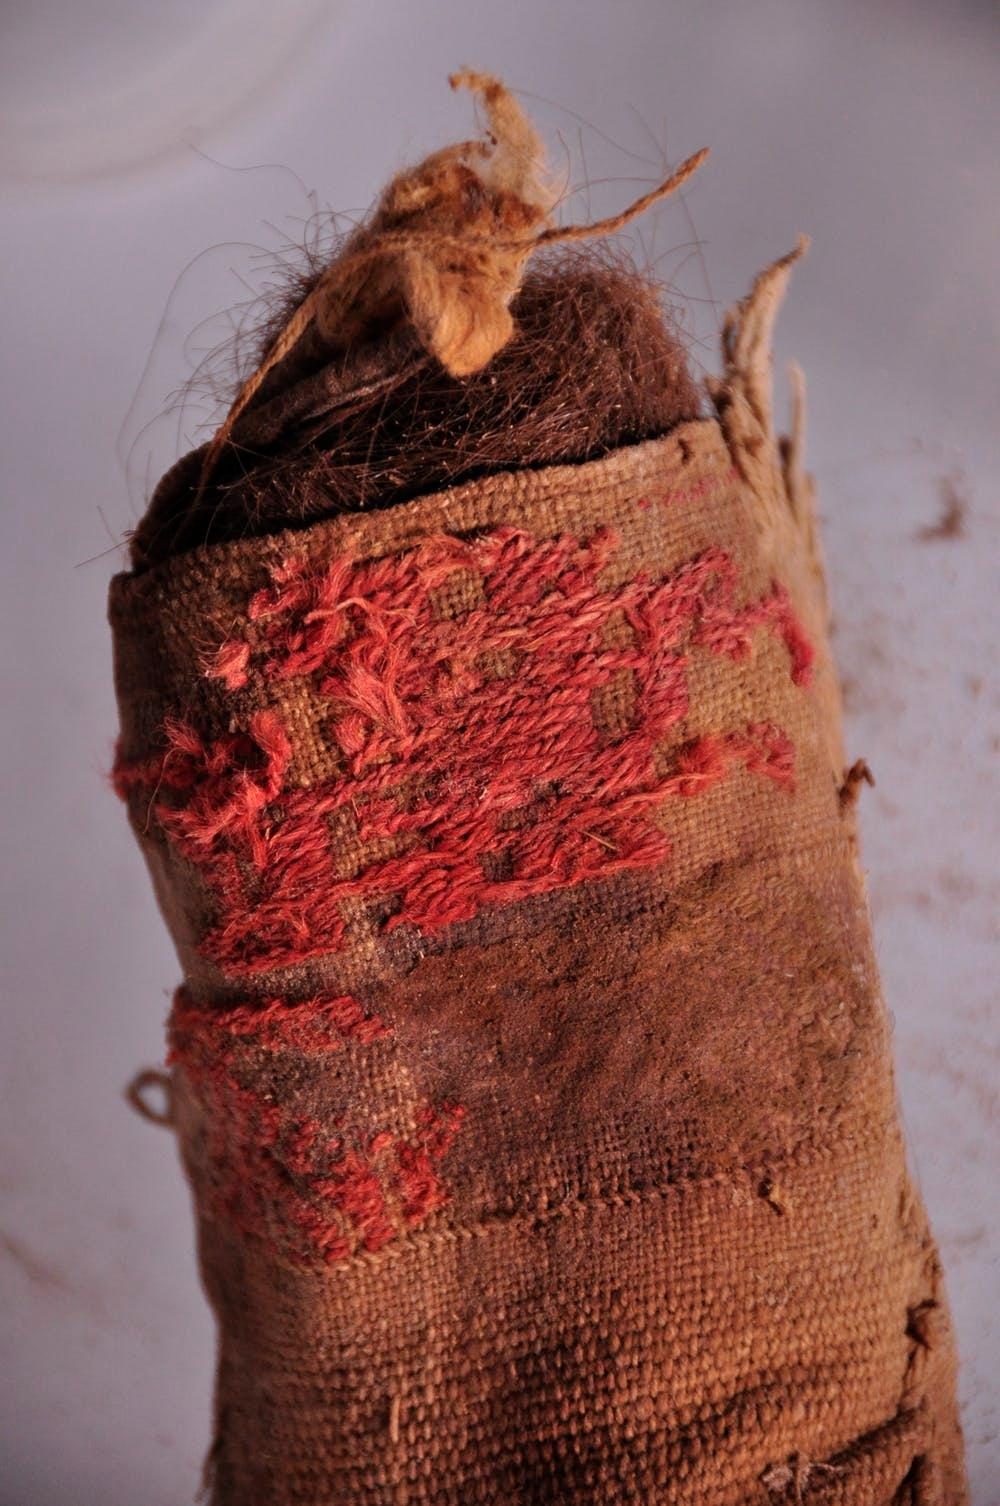 A woven cloth bag stuffed with human hair.